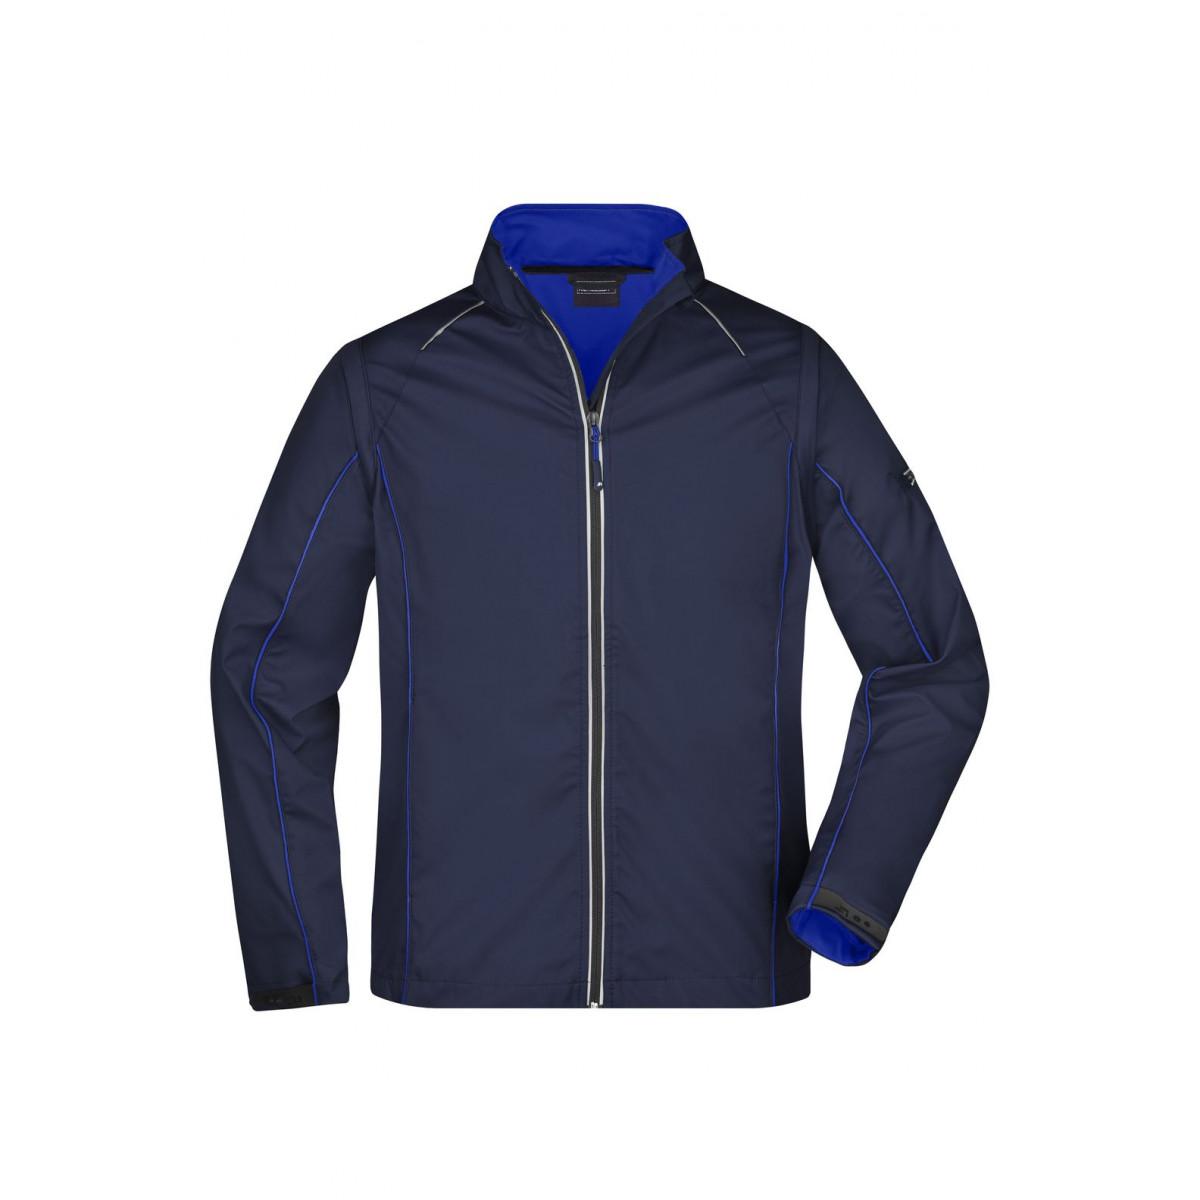 Куртка мужская JN1122 Mens Zip-Off Softshell Jacket - Темно-синий/Ярко-синий